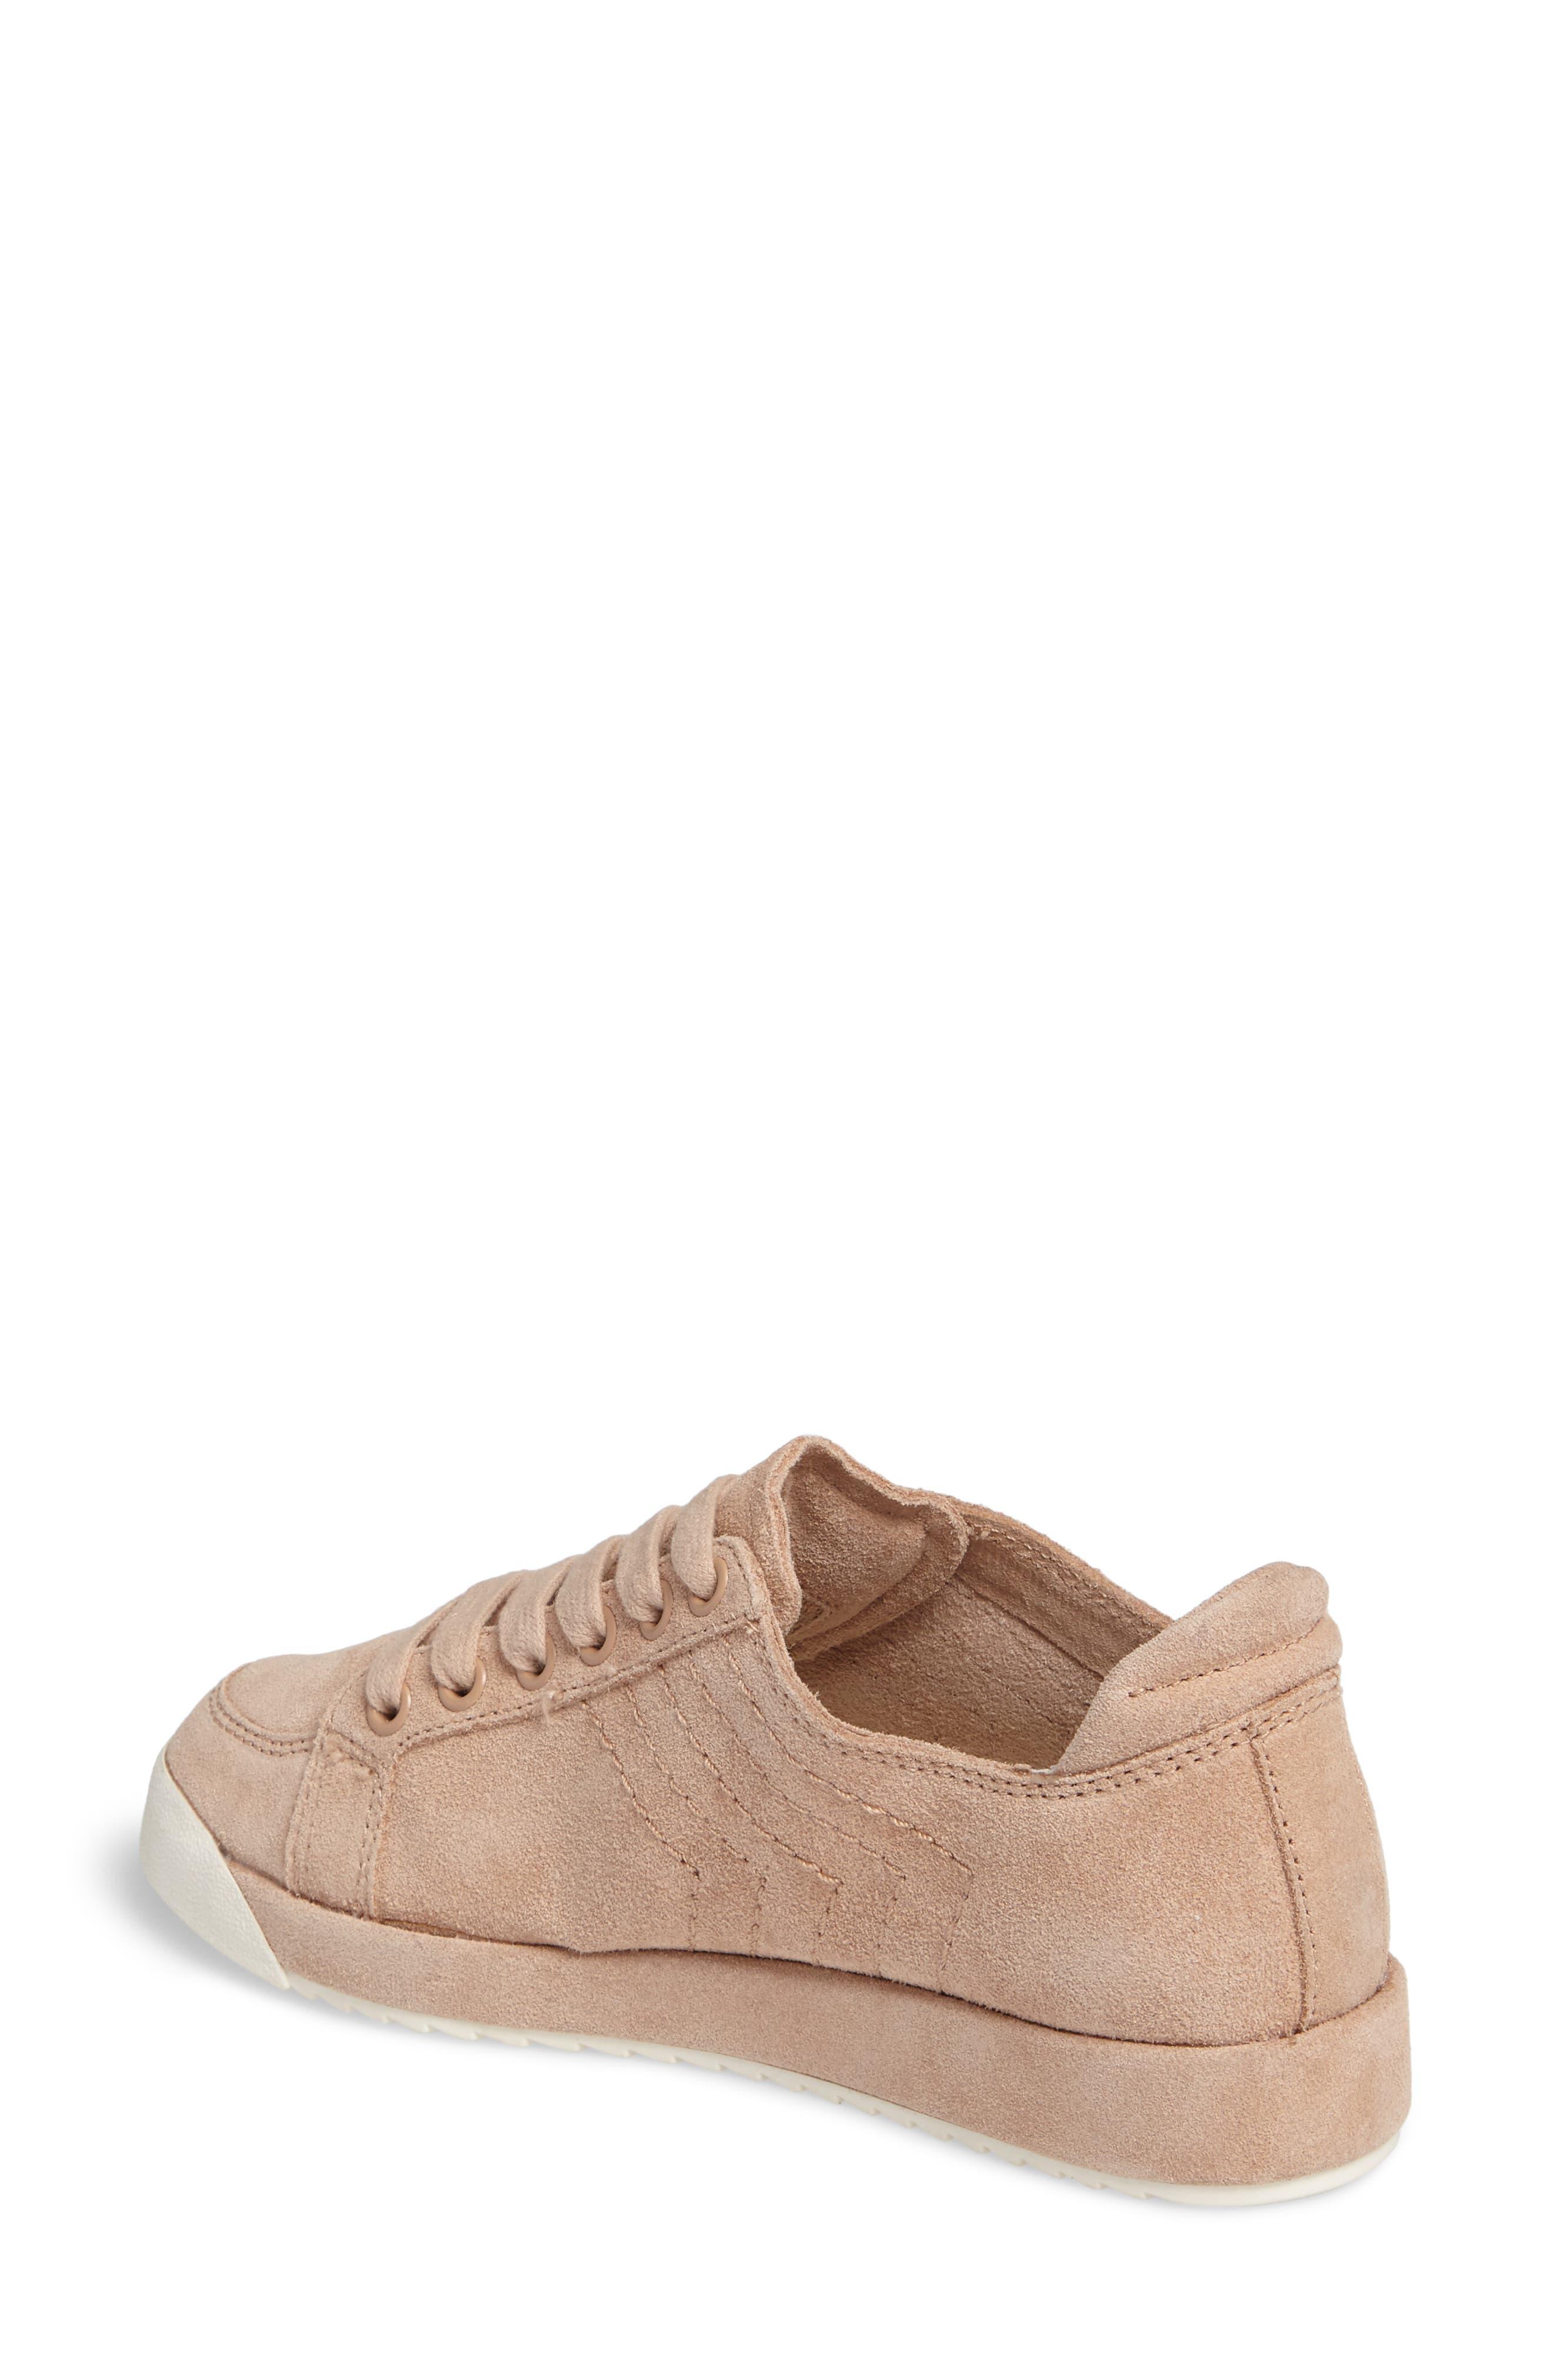 Sage Low-Top Sneaker,                             Alternate thumbnail 4, color,